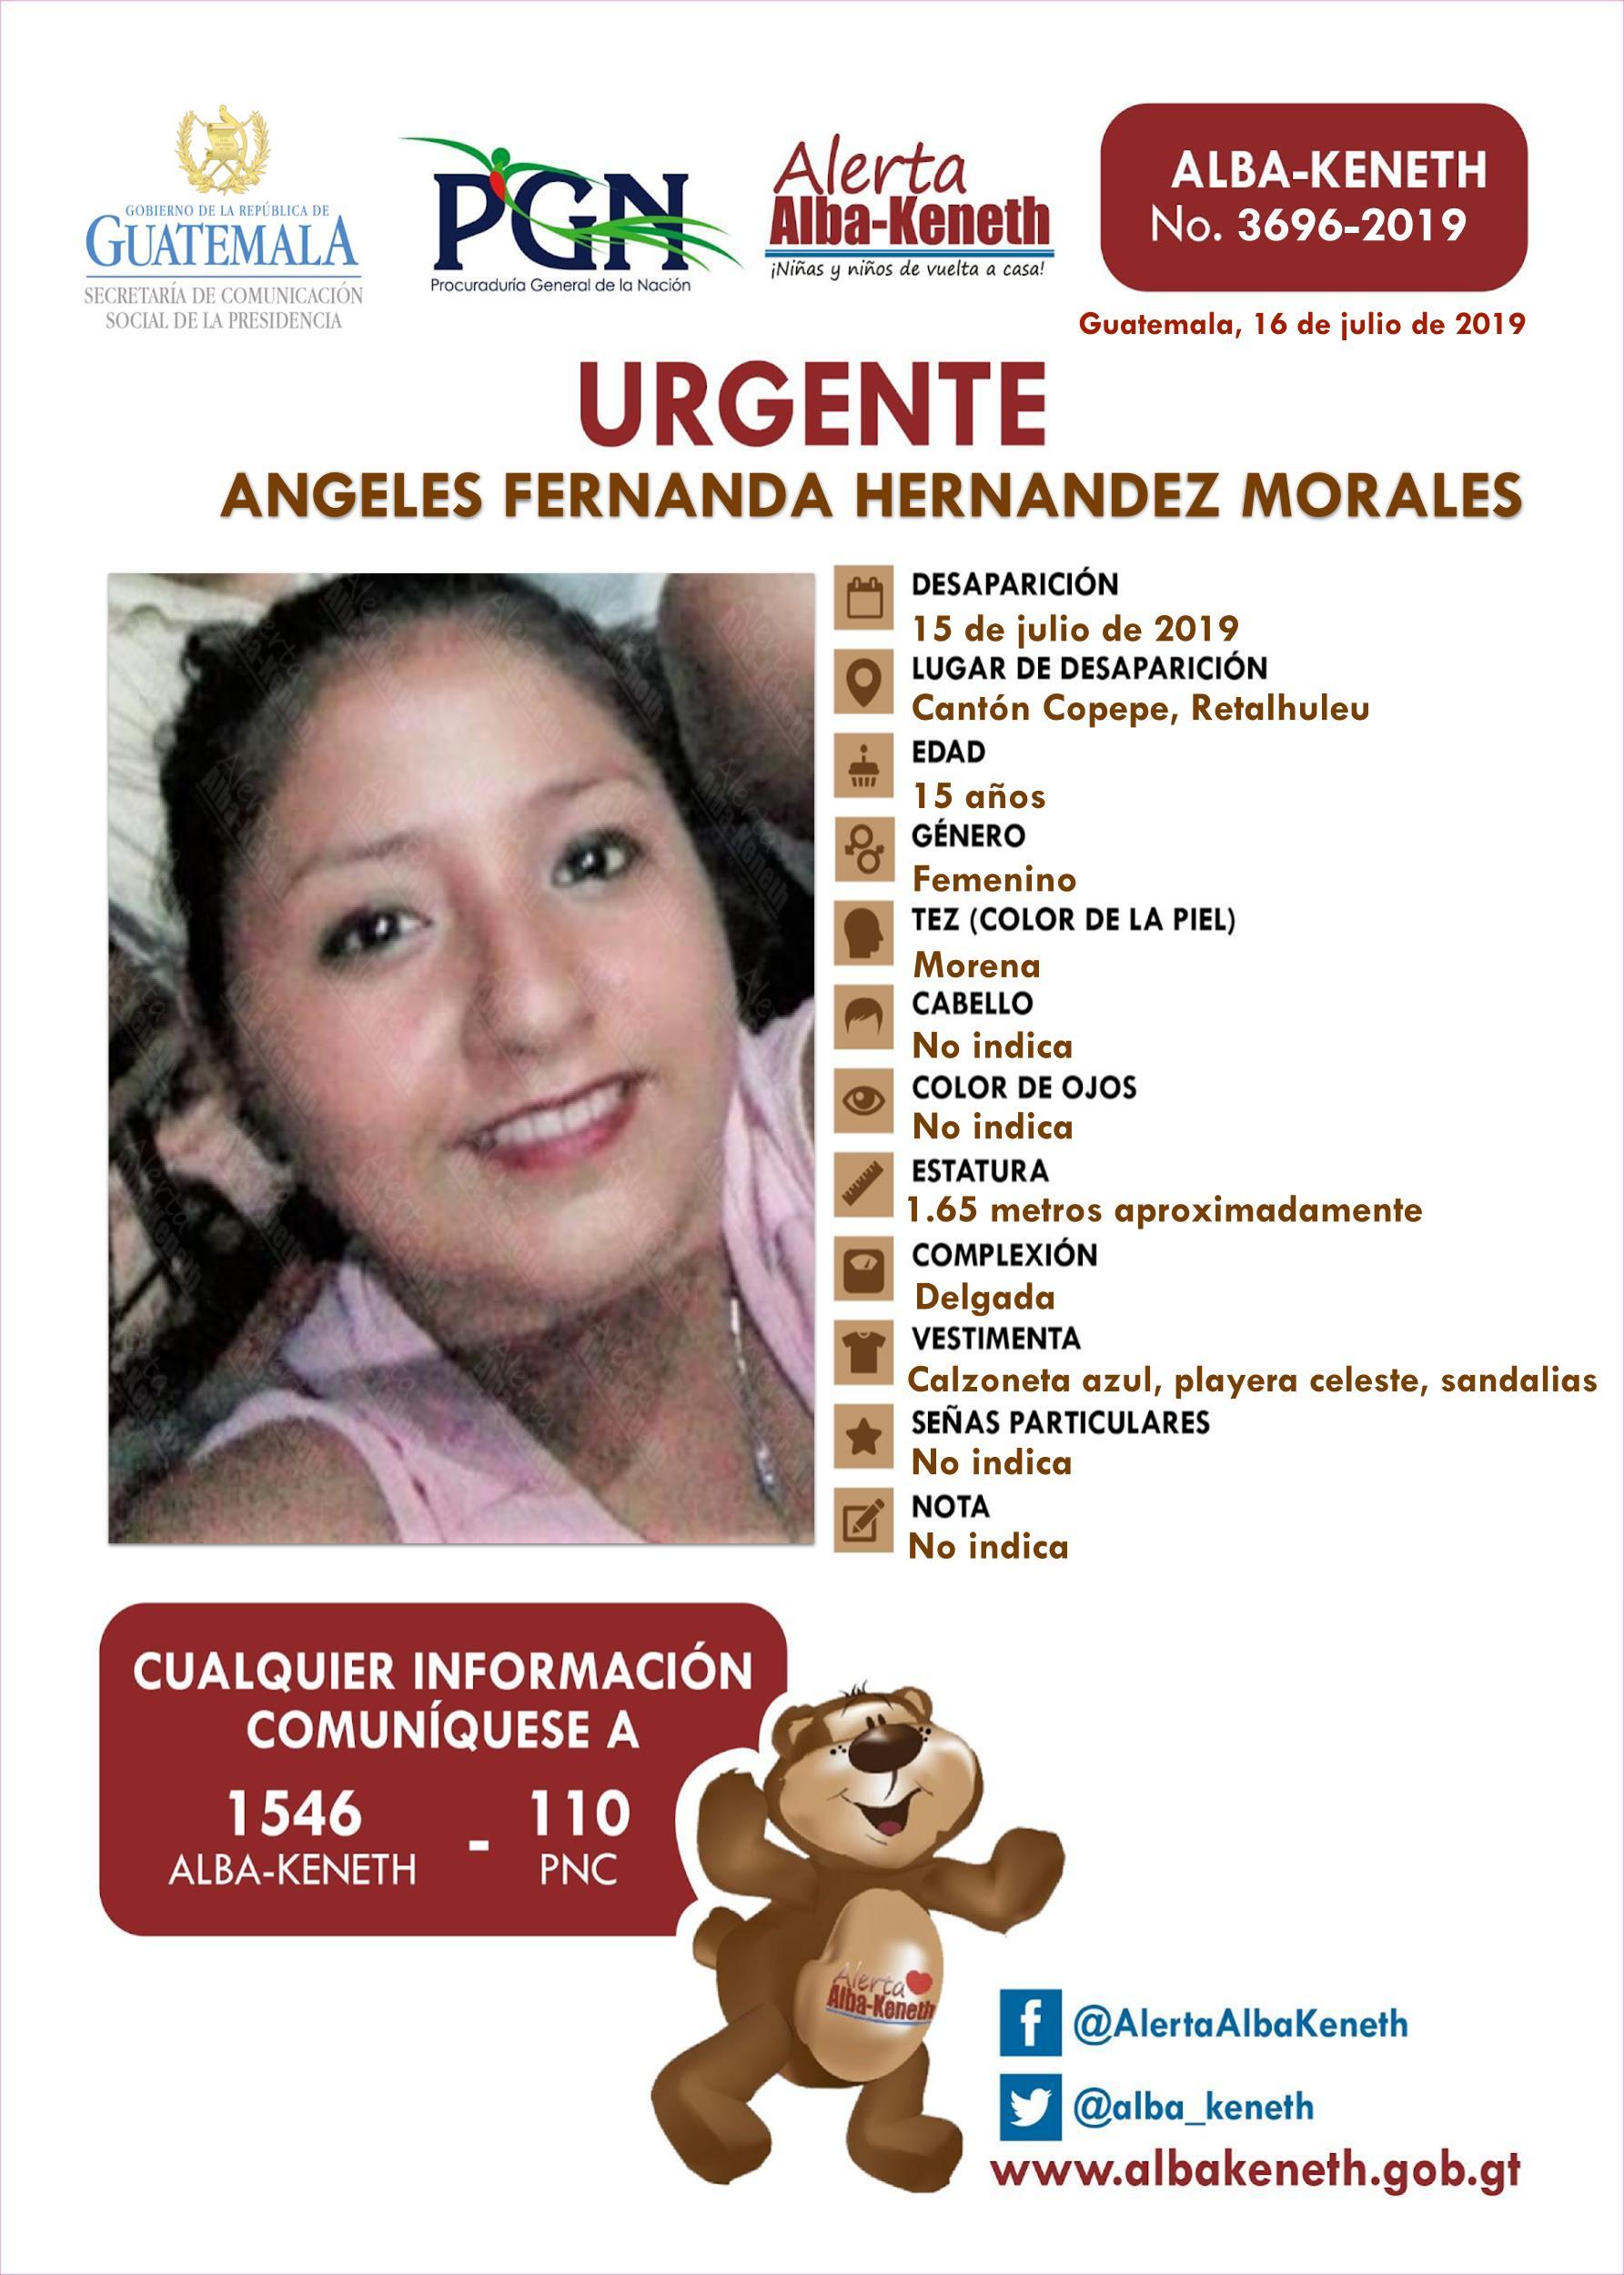 Angeles Fernanda Herandez Morales